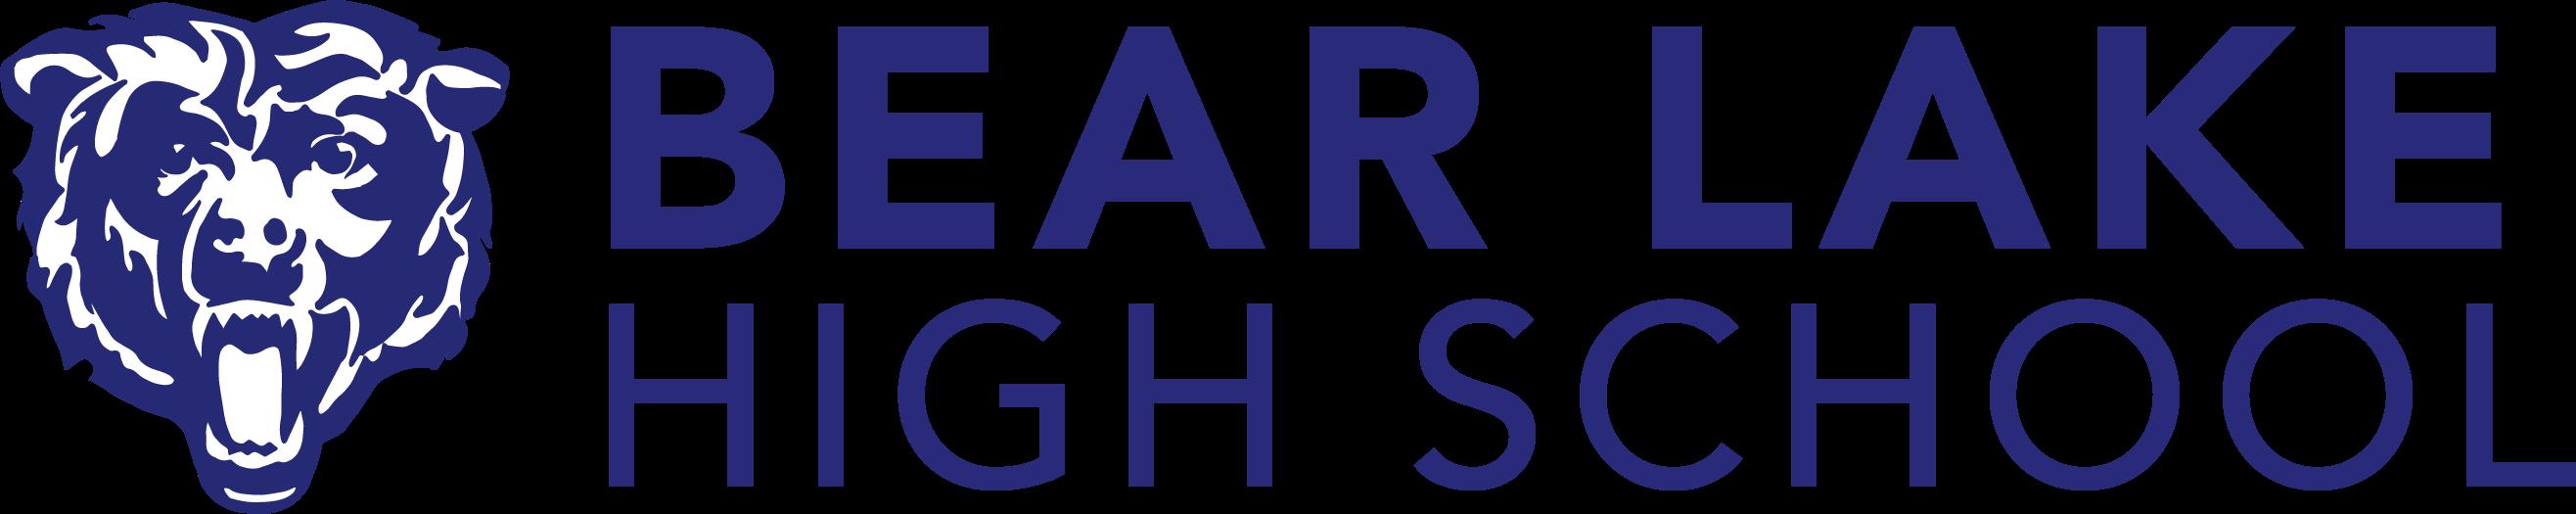 Bear Lake High School